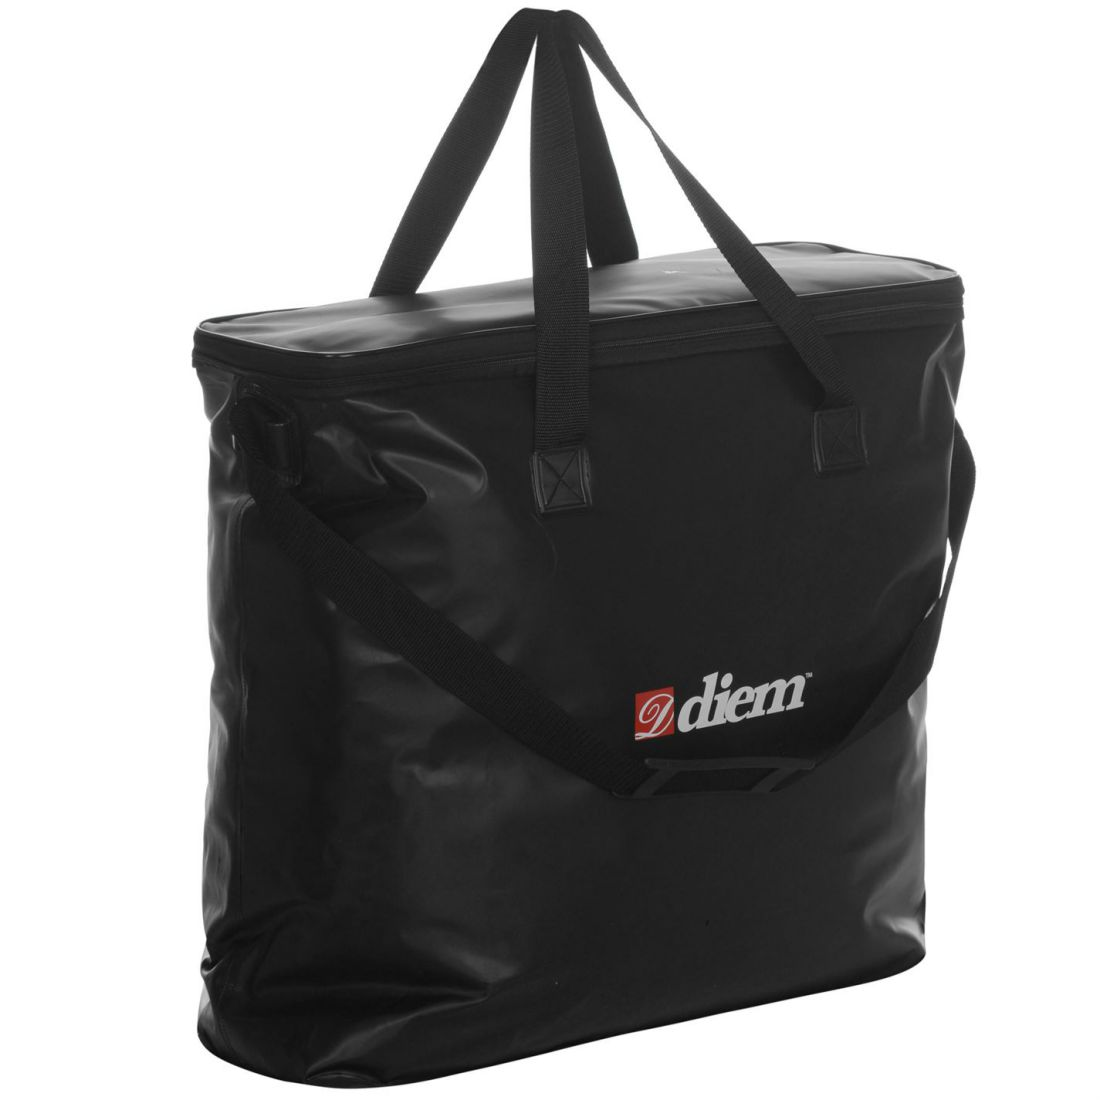 bc8e88e9537 Details about Diem Unisex EVA Keepnet Bag Fishing Accessory Waterproof Zip